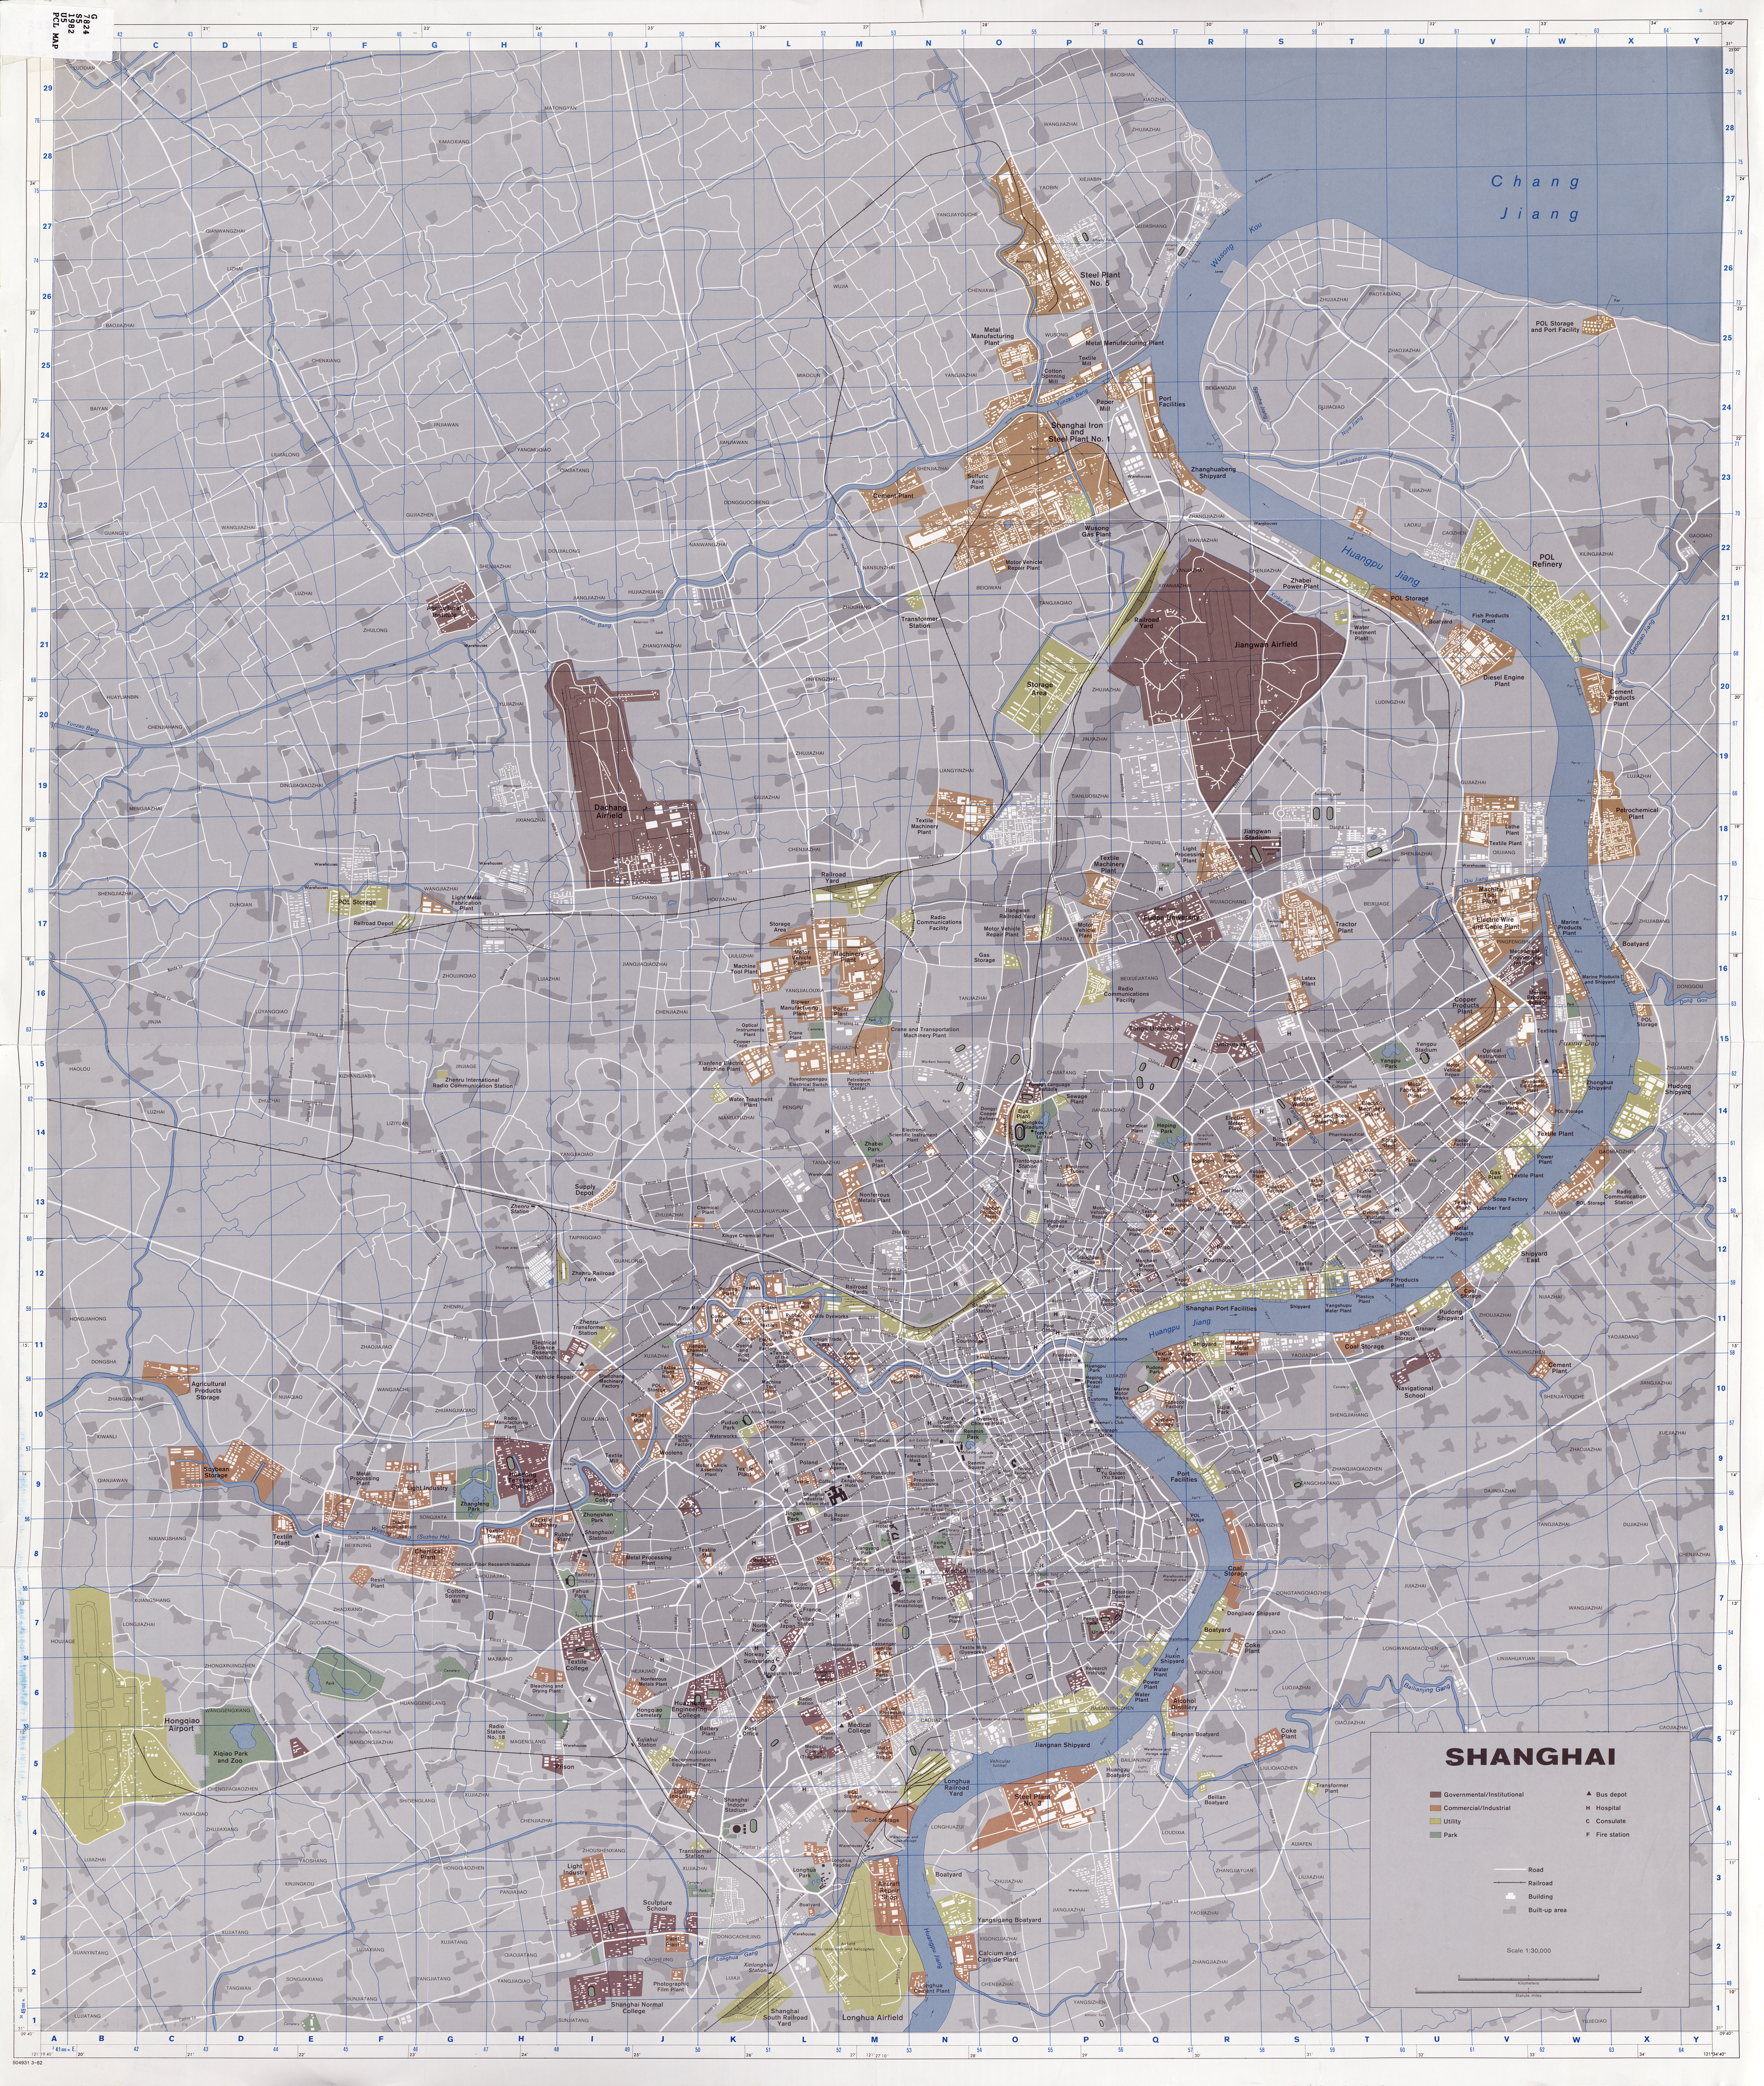 Shanghai Street Map Cia's Map of Shanghai — in